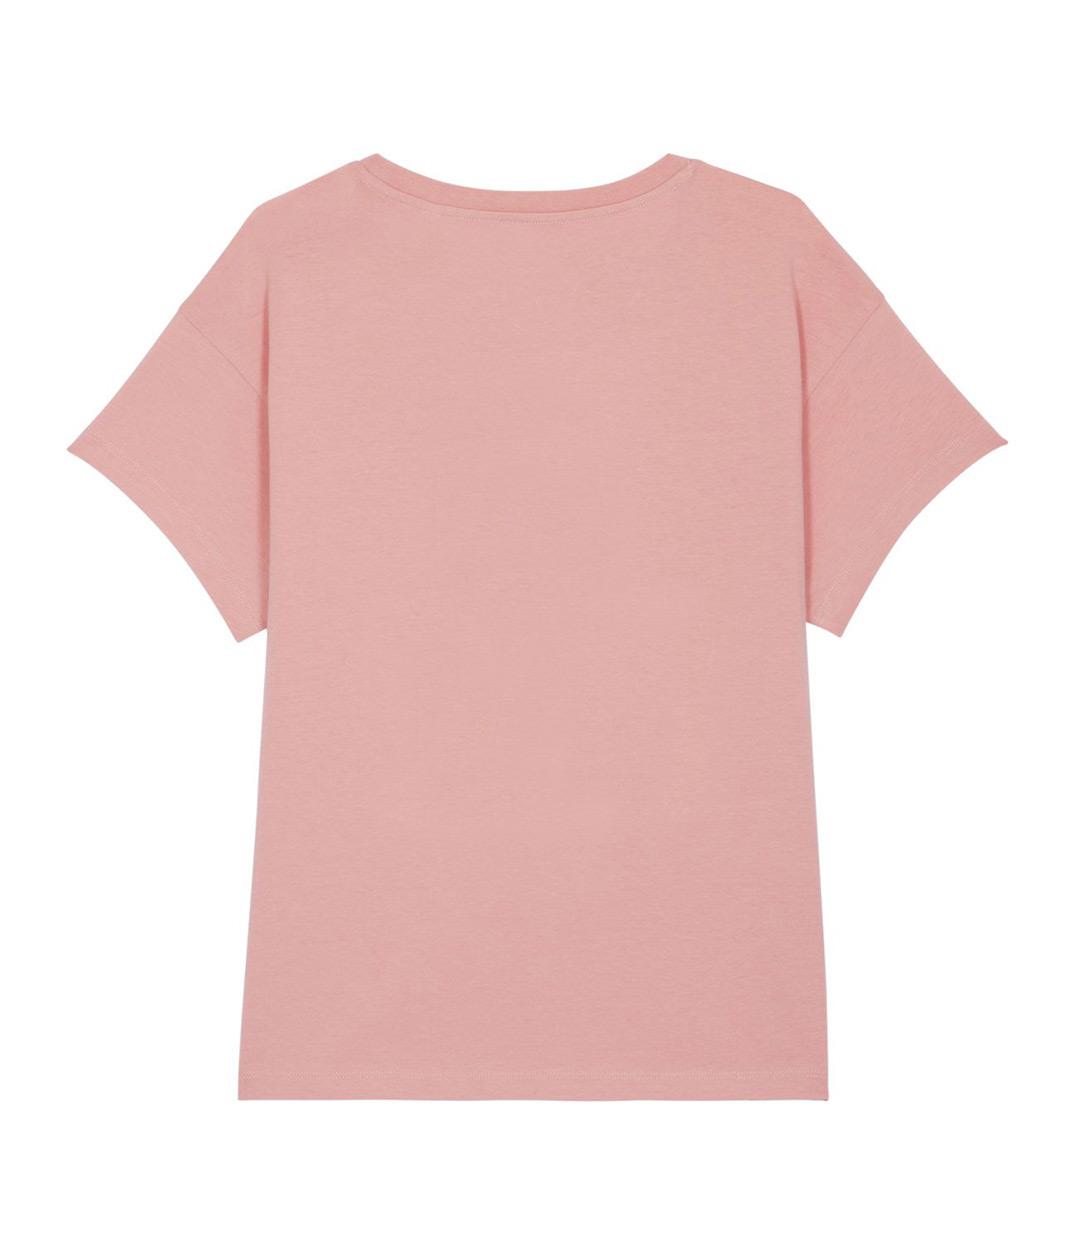 t-shirt rose de dos leonor roversi